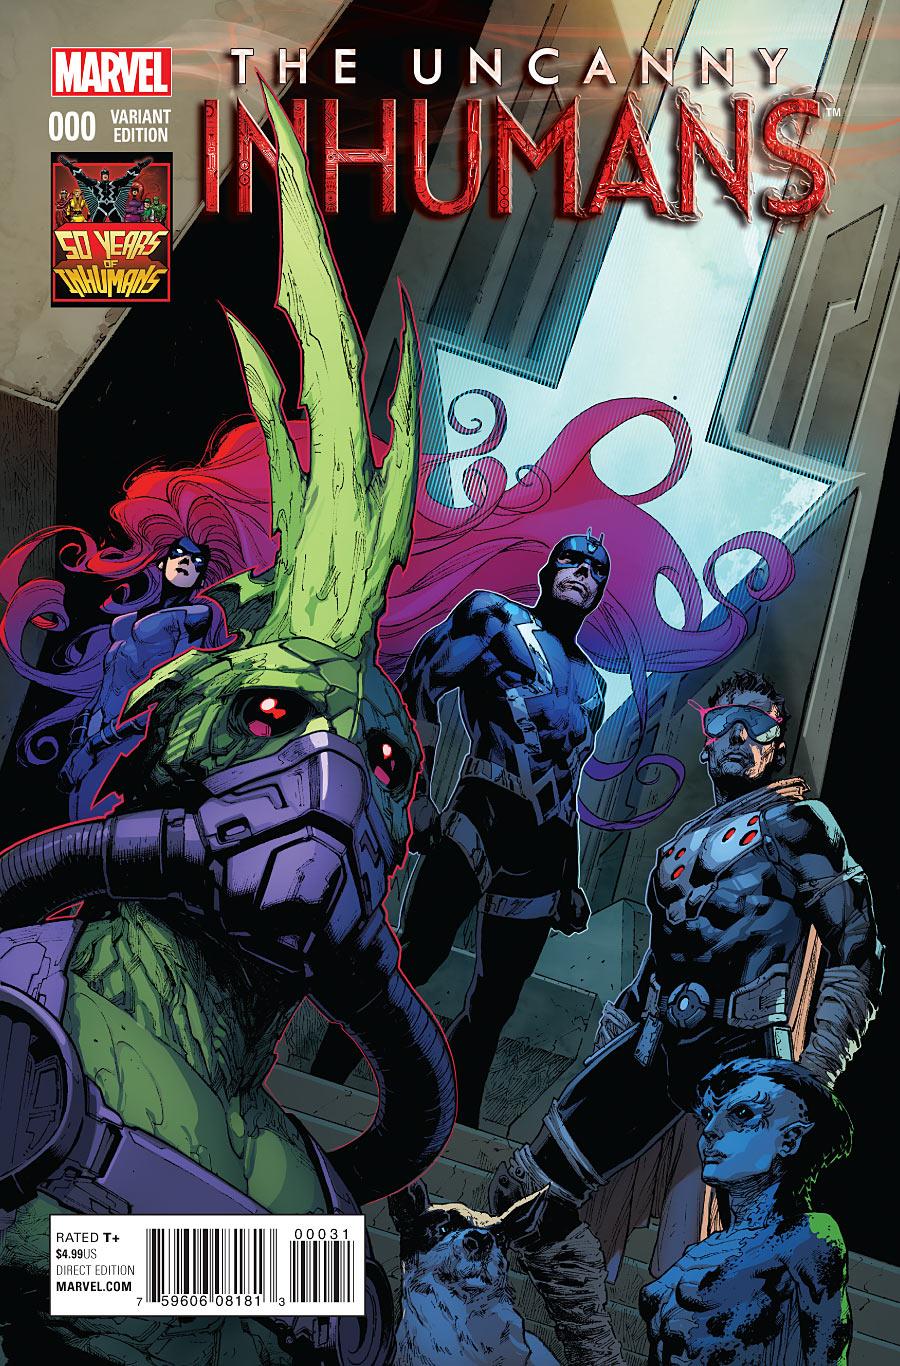 Uncanny Inhumans Vol 1 0 50 Years of Inhumans Variant.jpg